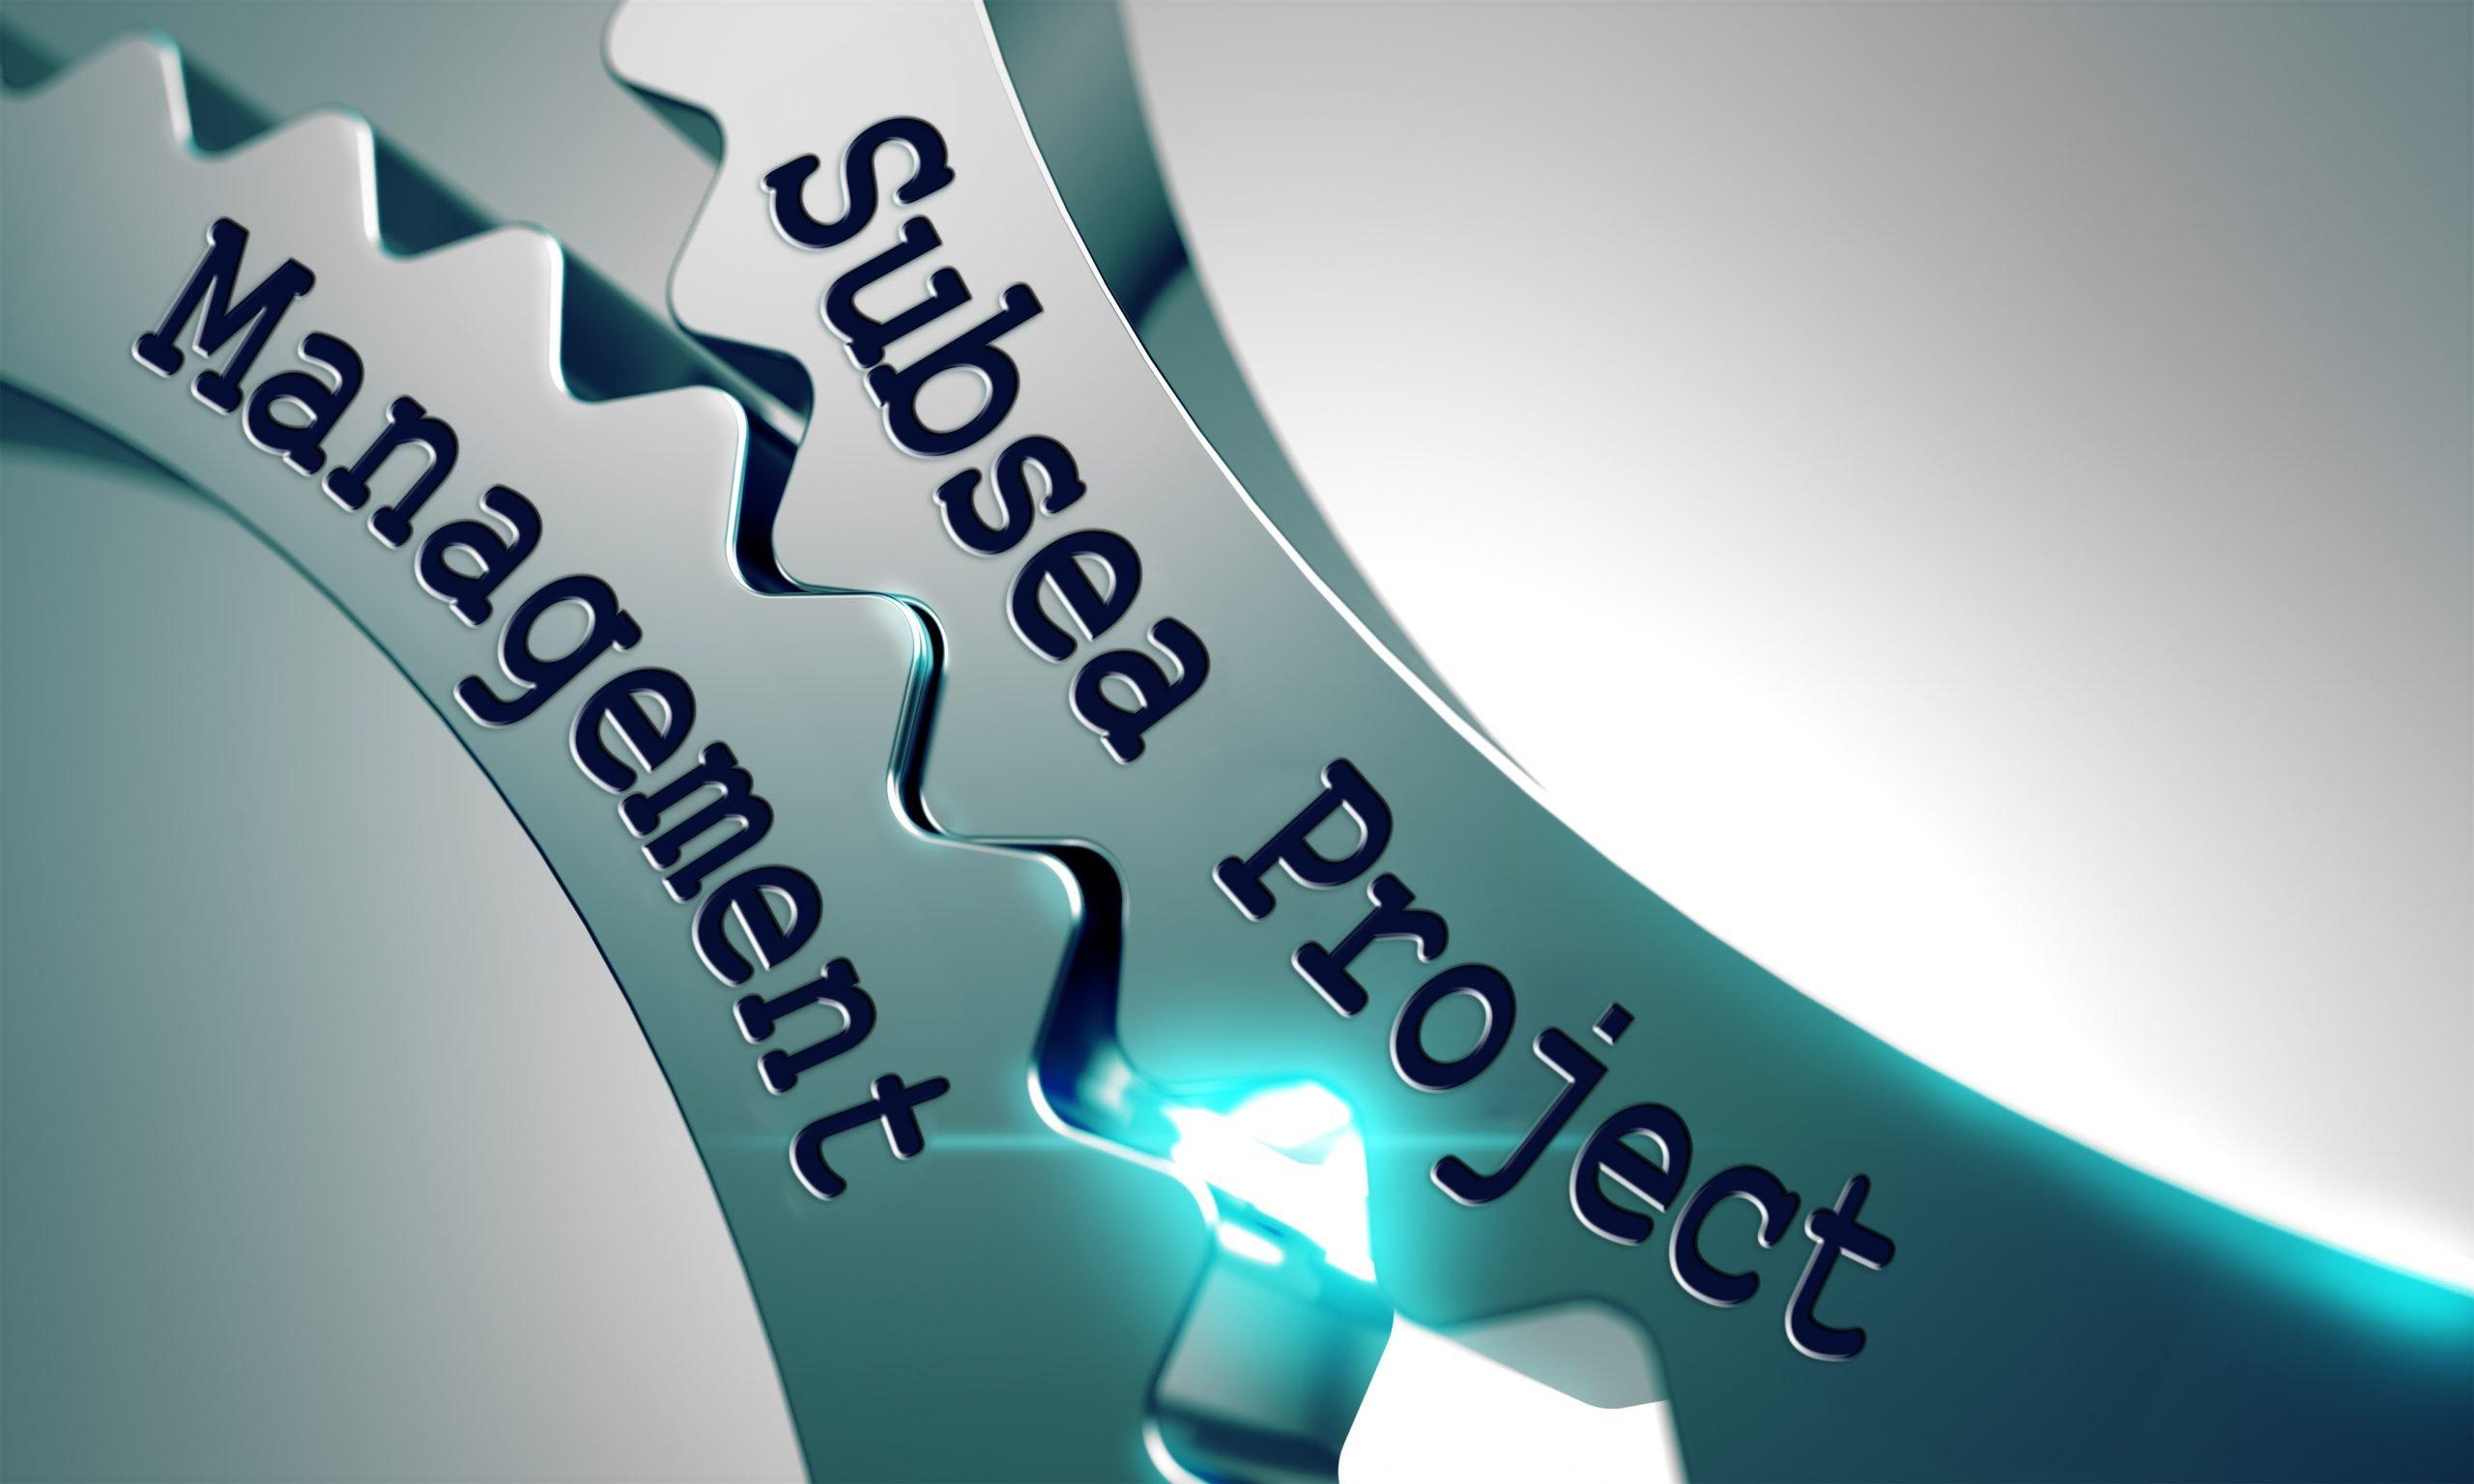 Subsea Project Development